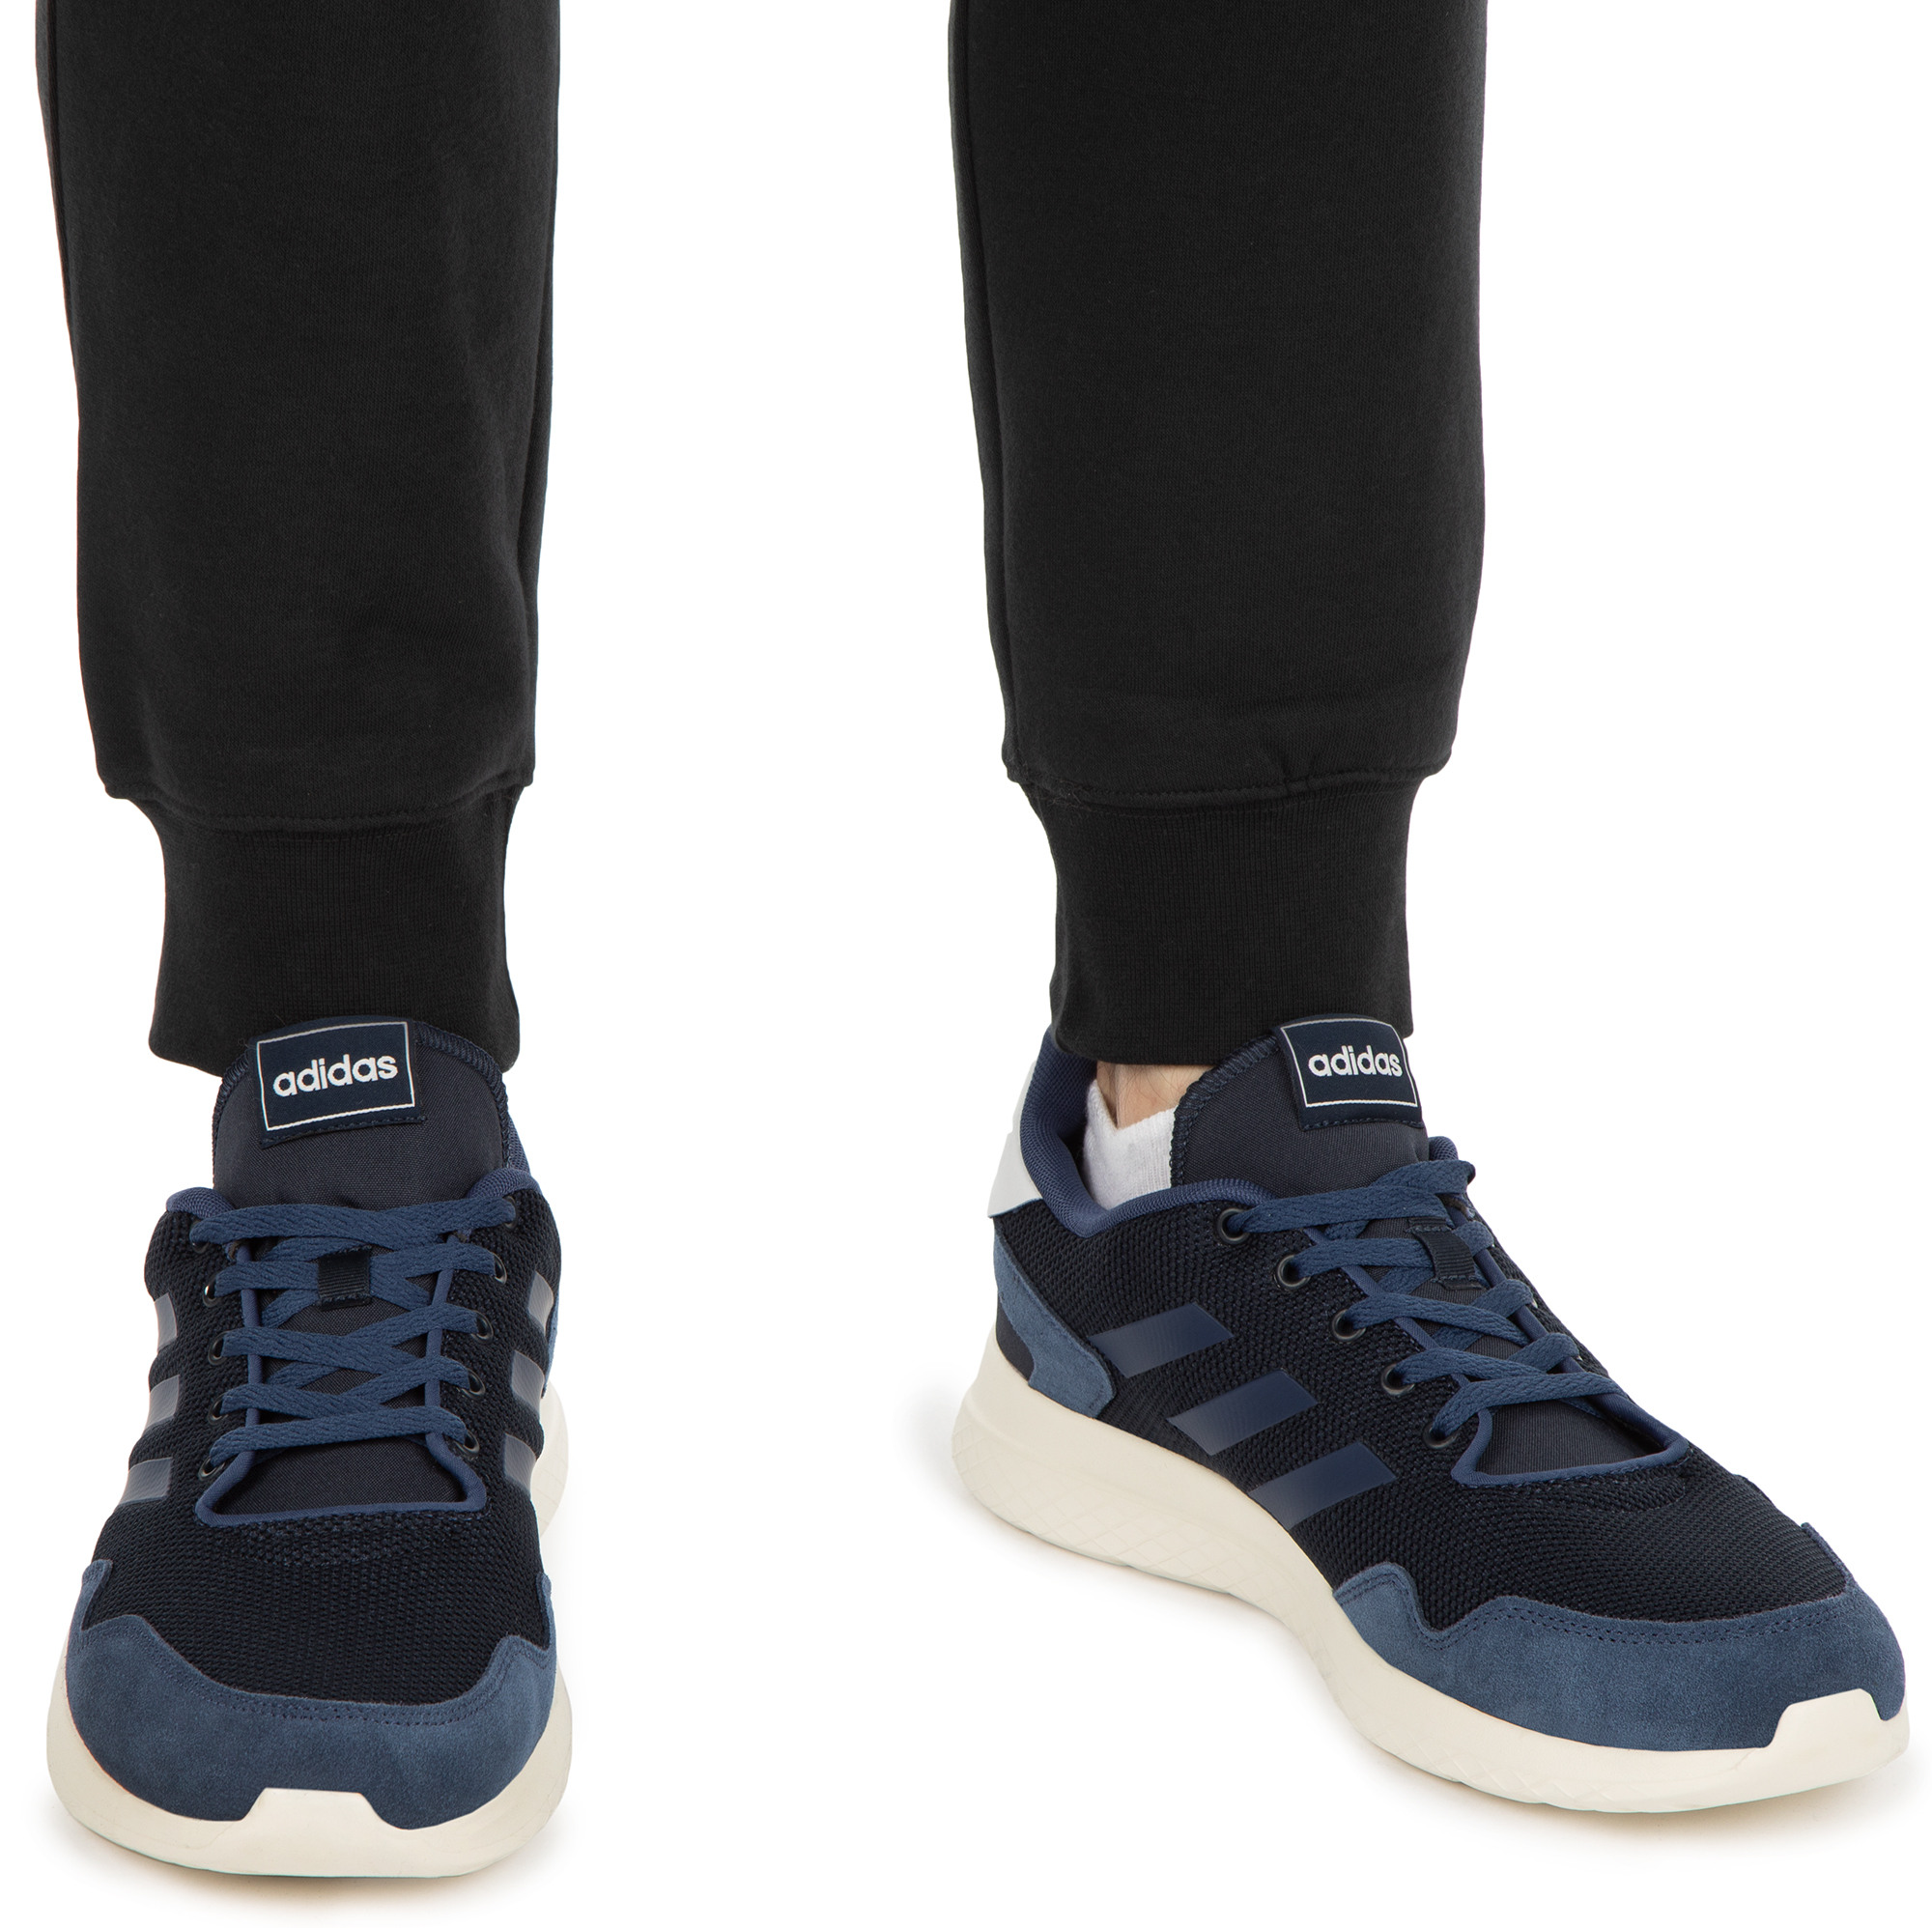 Adidas Кроссовки мужские Archivo, размер 46